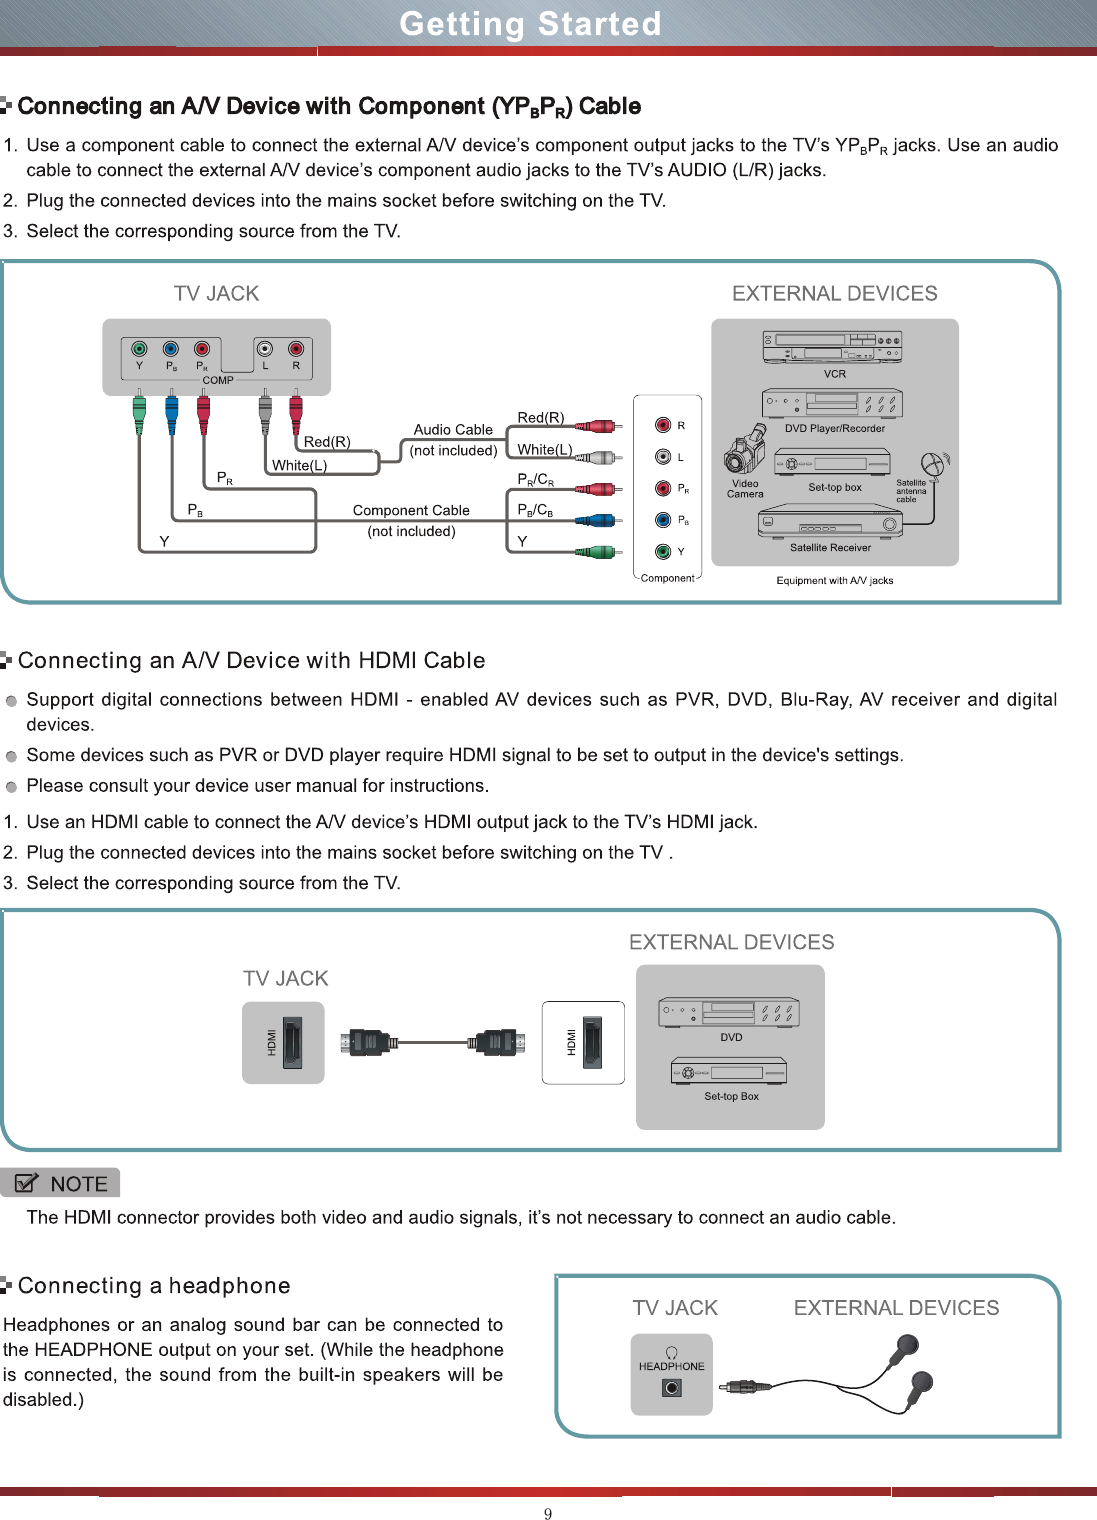 Hisense Electric LCDF0010 LED LCD TV User Manual ES G121352